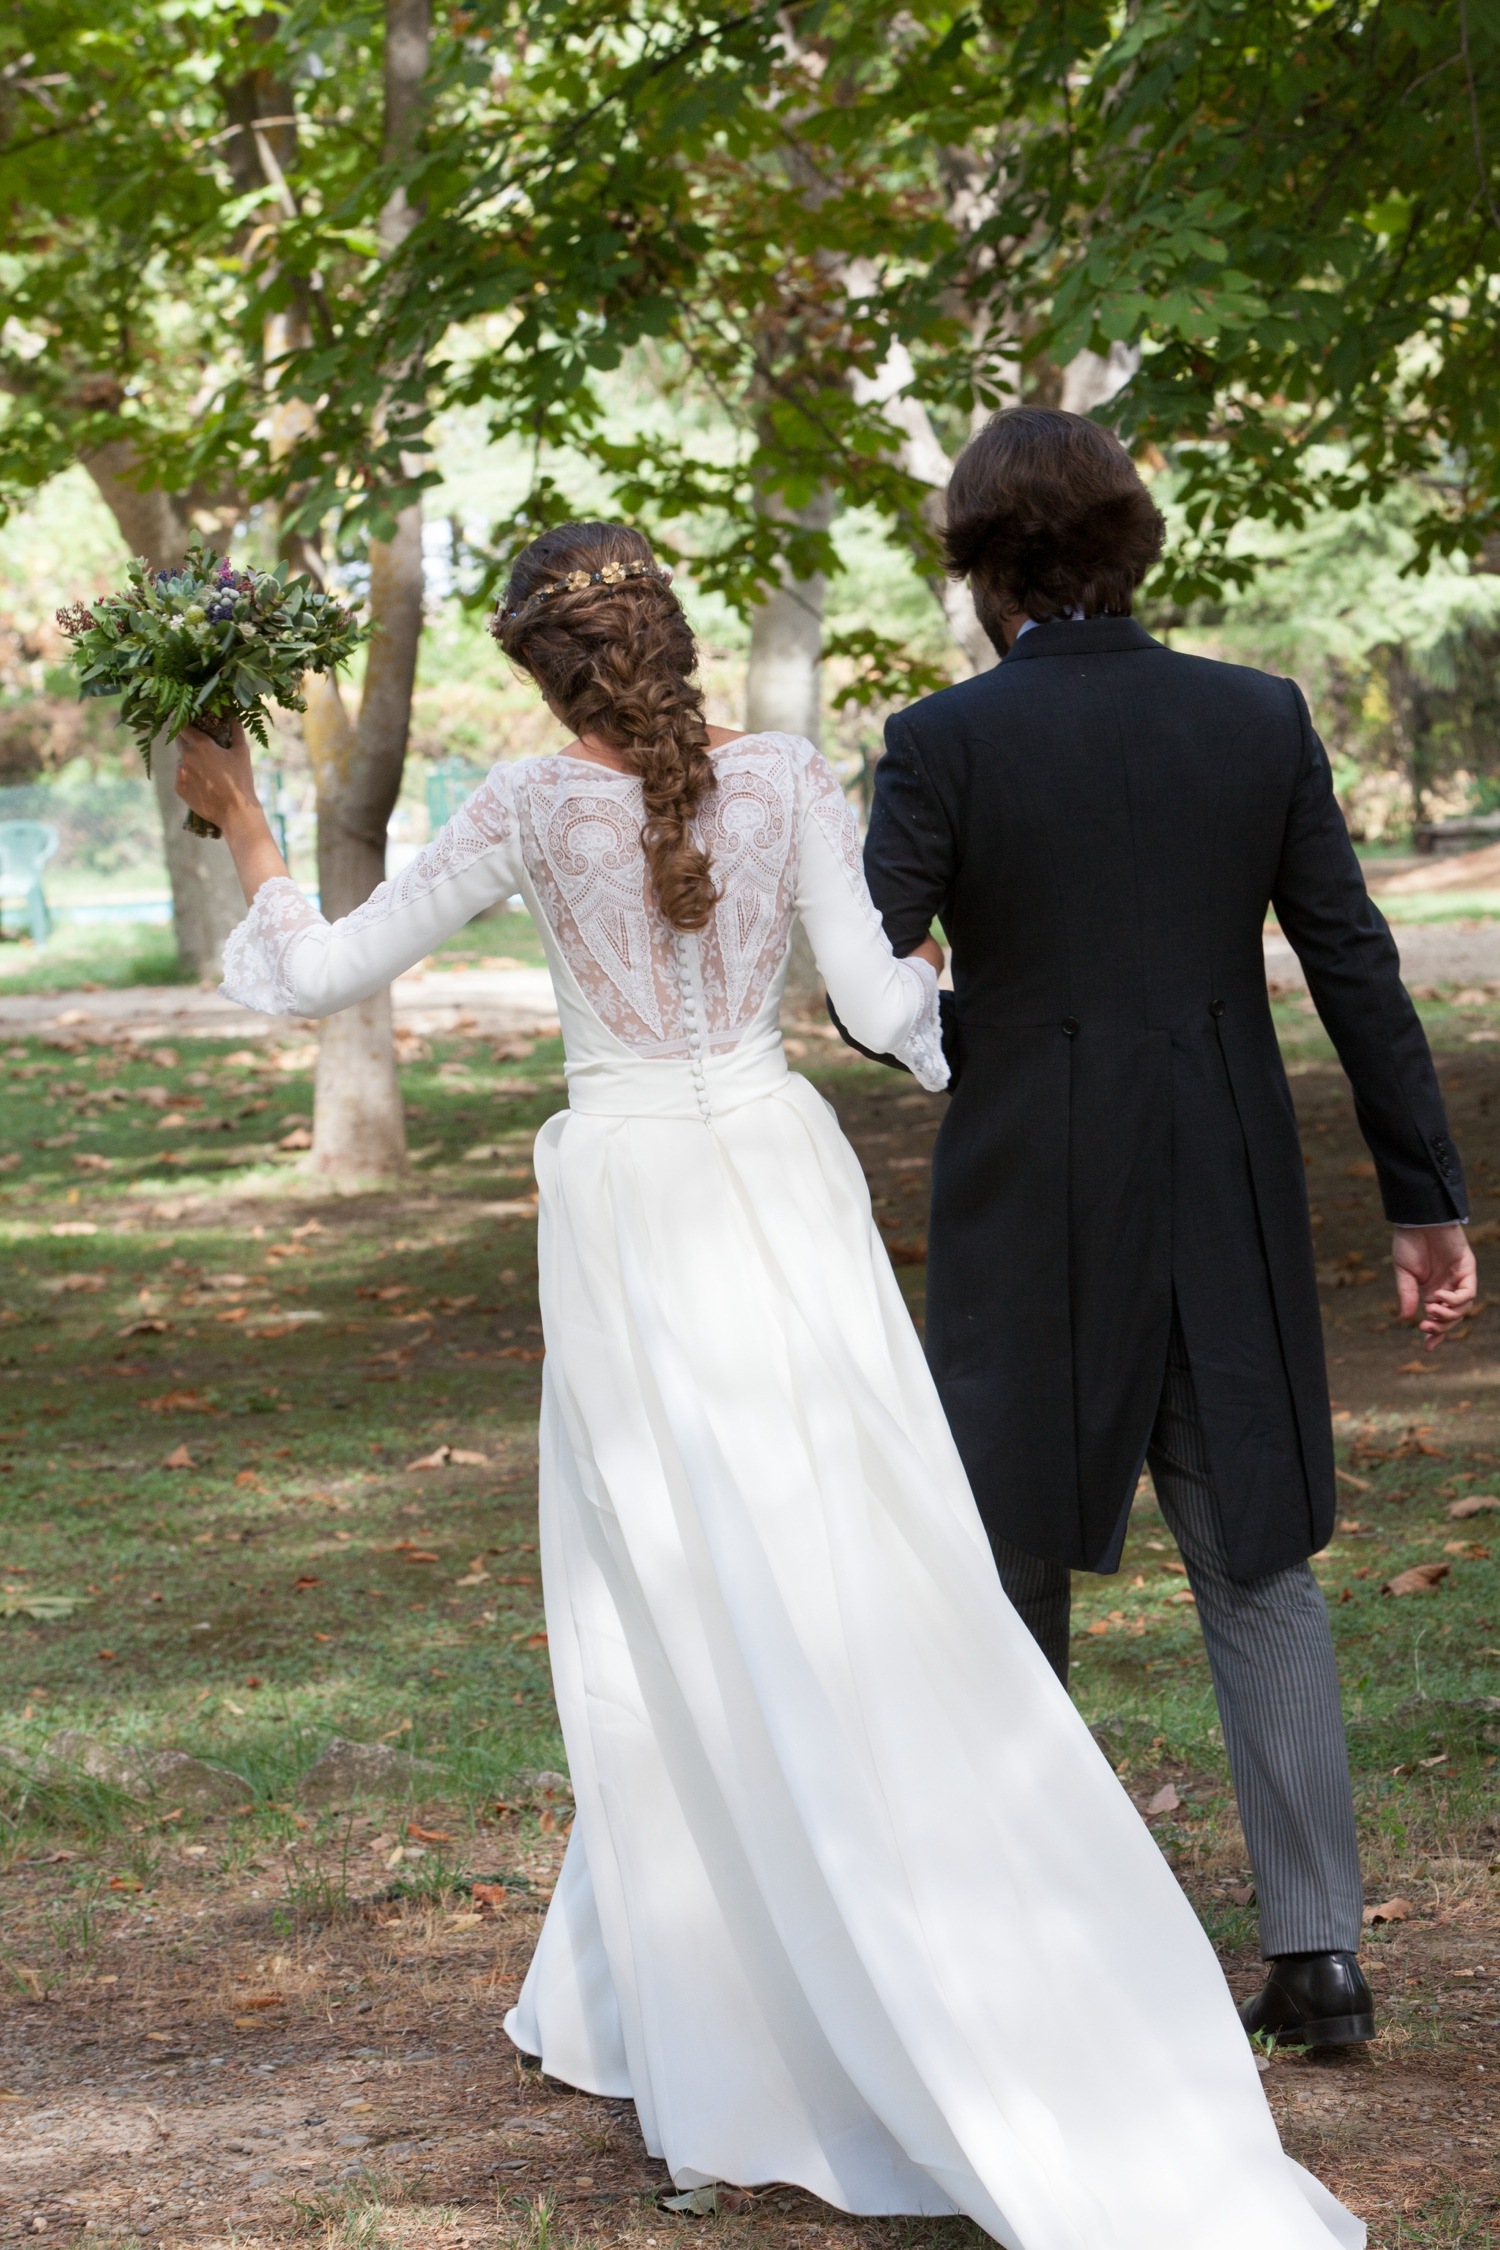 bodas-made-in-style-novios-vestido-de-novia-peinado-romantico-trenza